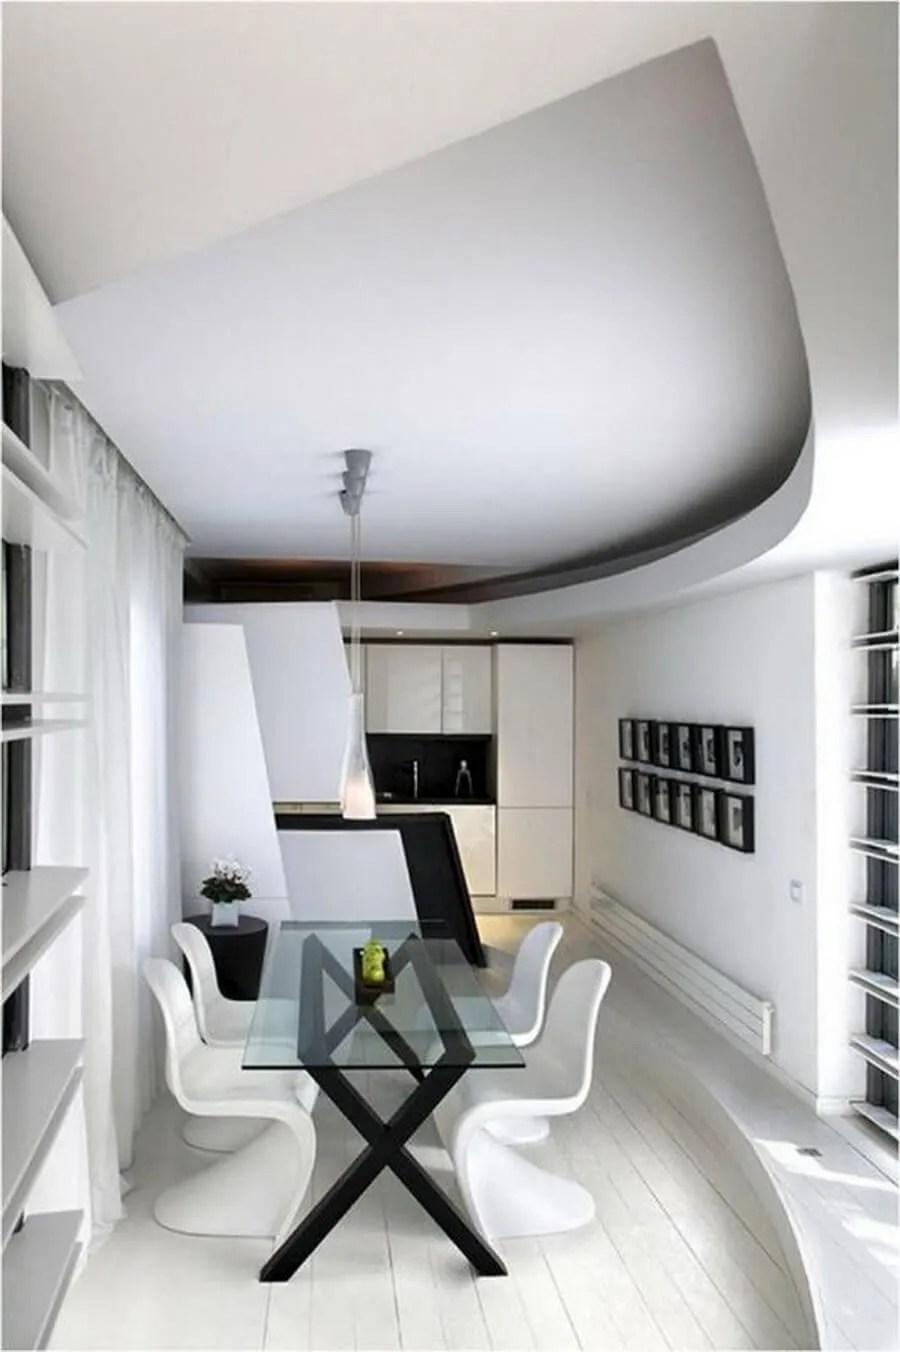 Interior decorating black and white - Modern Minimalist Dining Room Interior Decorating Ideas